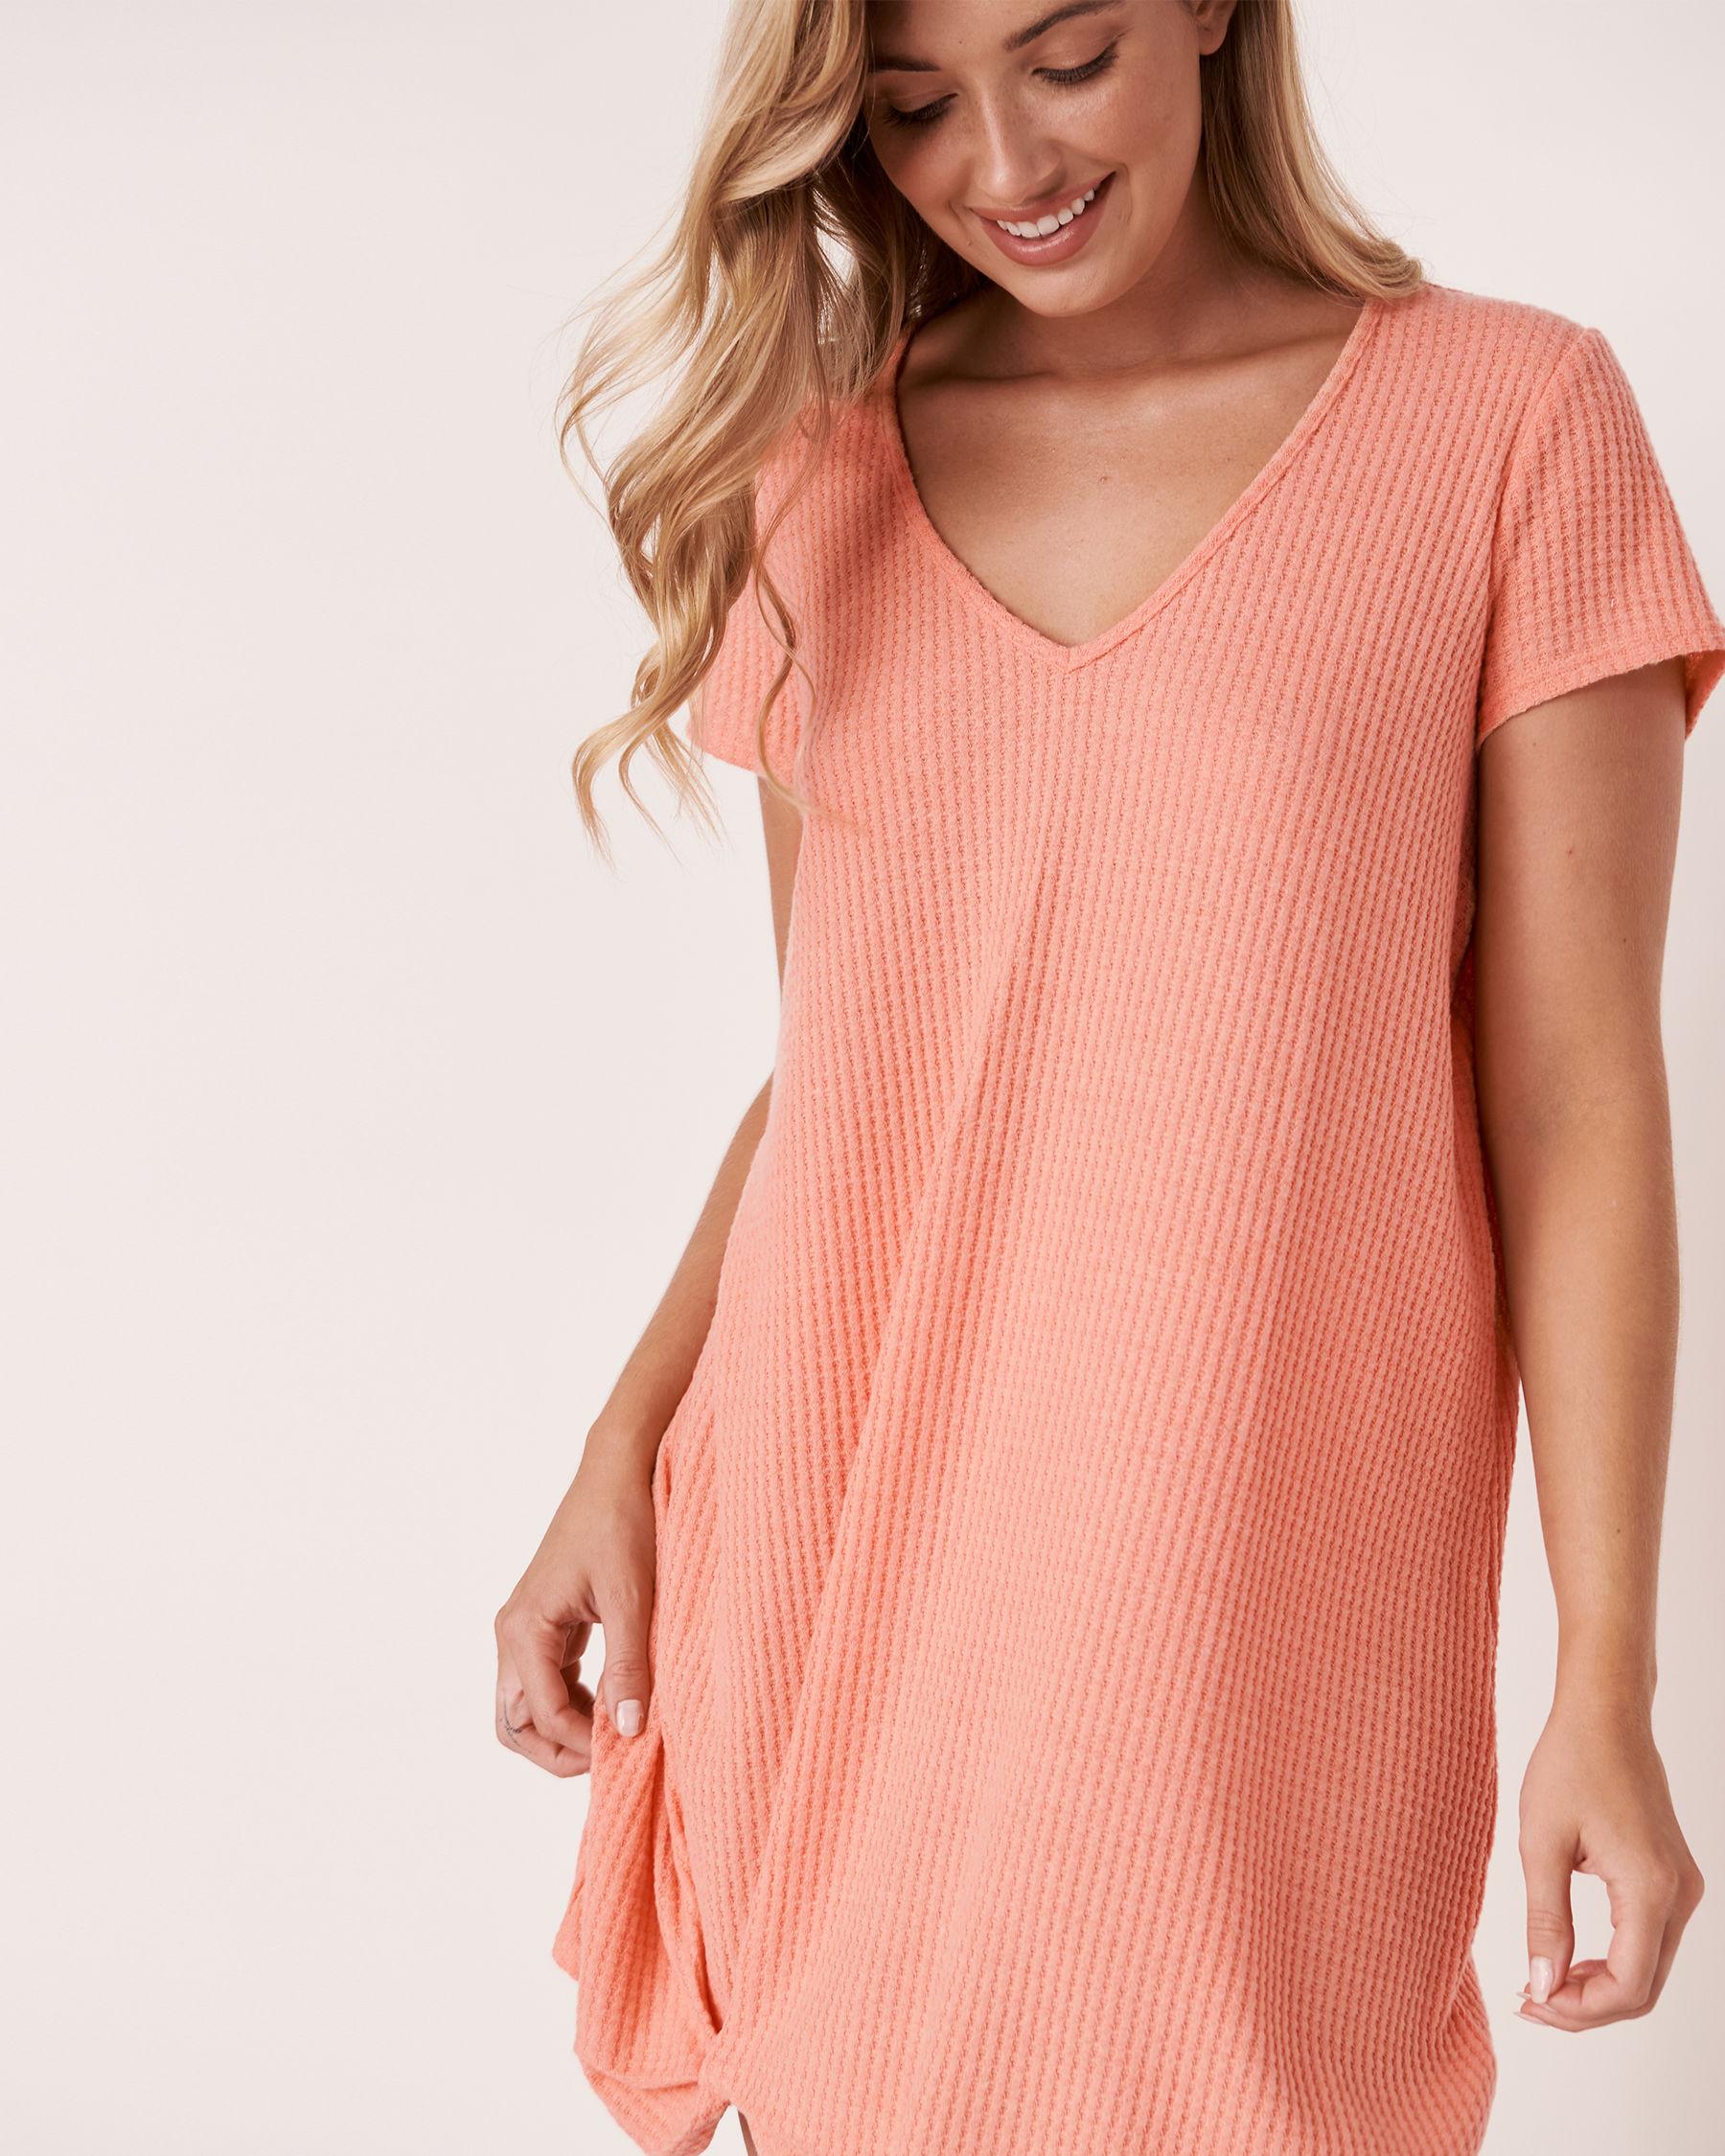 LA VIE EN ROSE AQUA Twisted Short Dress Coral 80300017 - View3